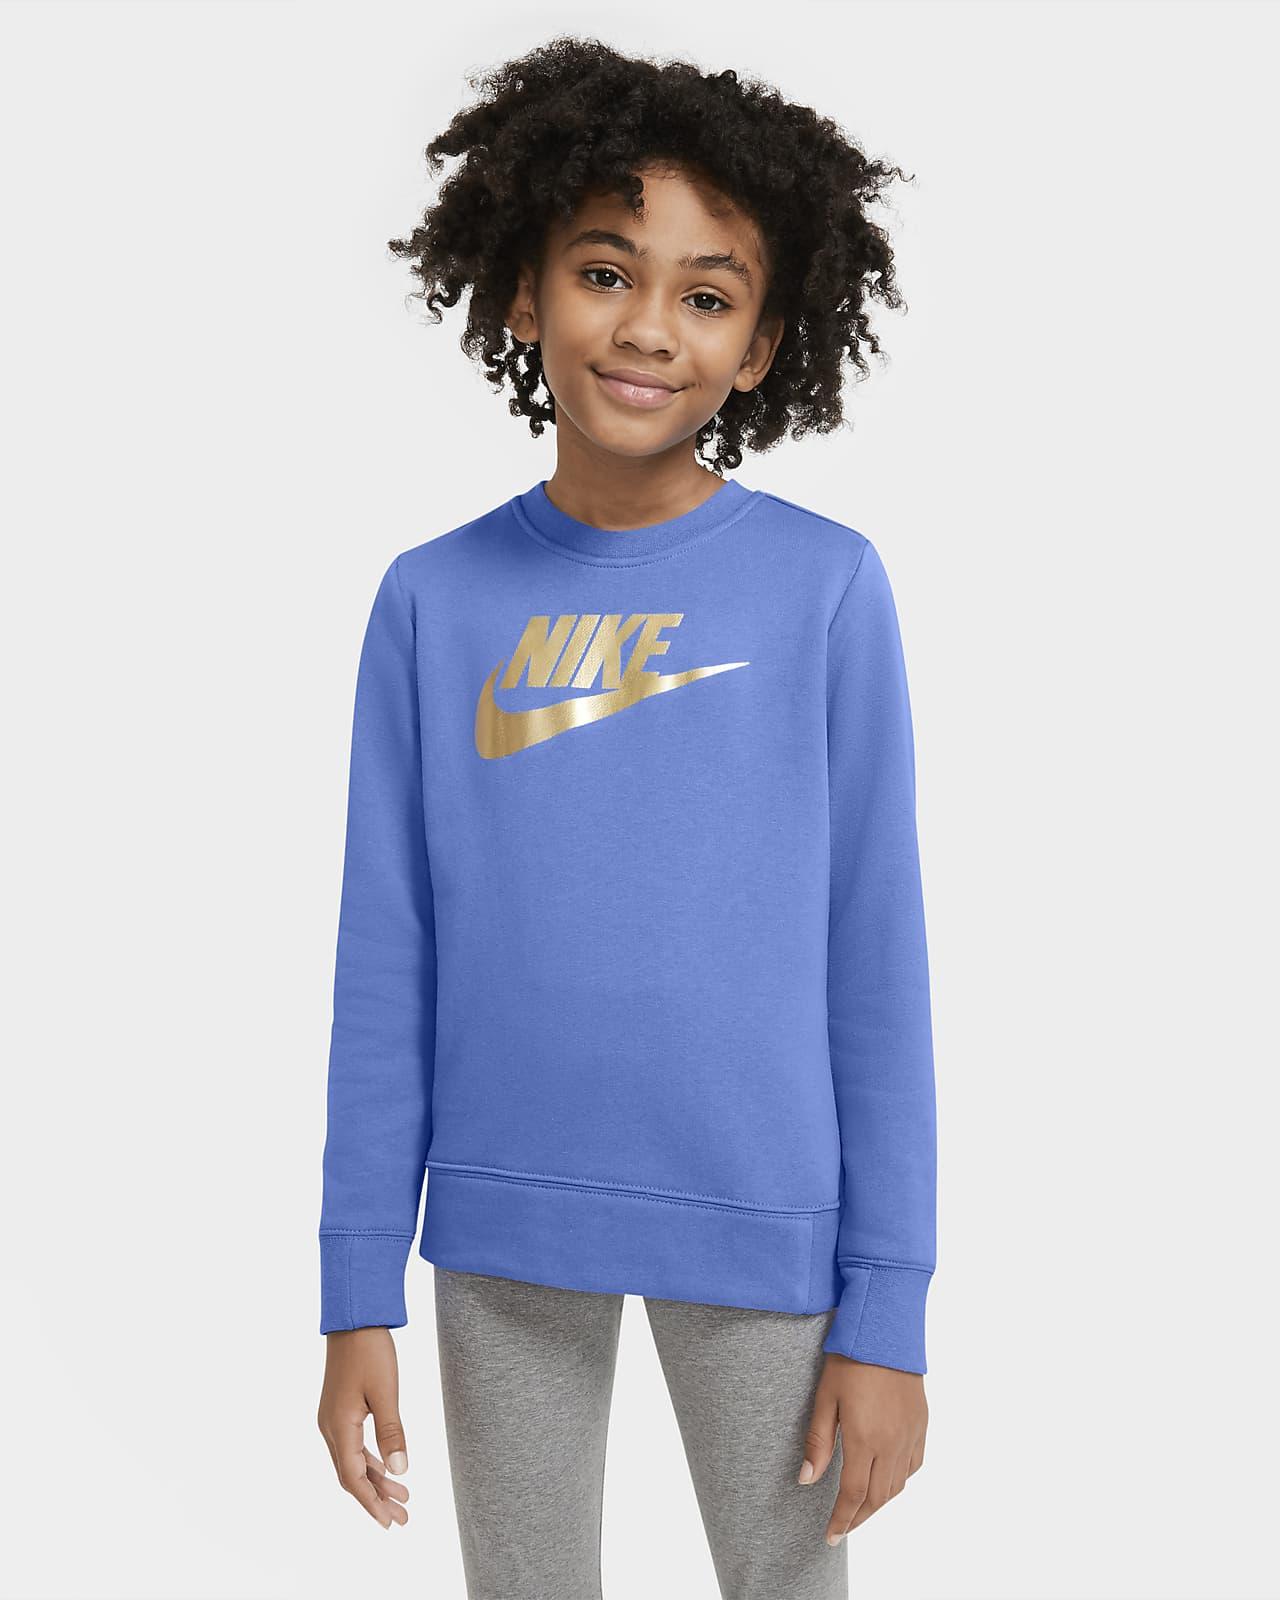 Nike Sportswear 大童 (女童) 法國毛圈布貼身圓領上衣